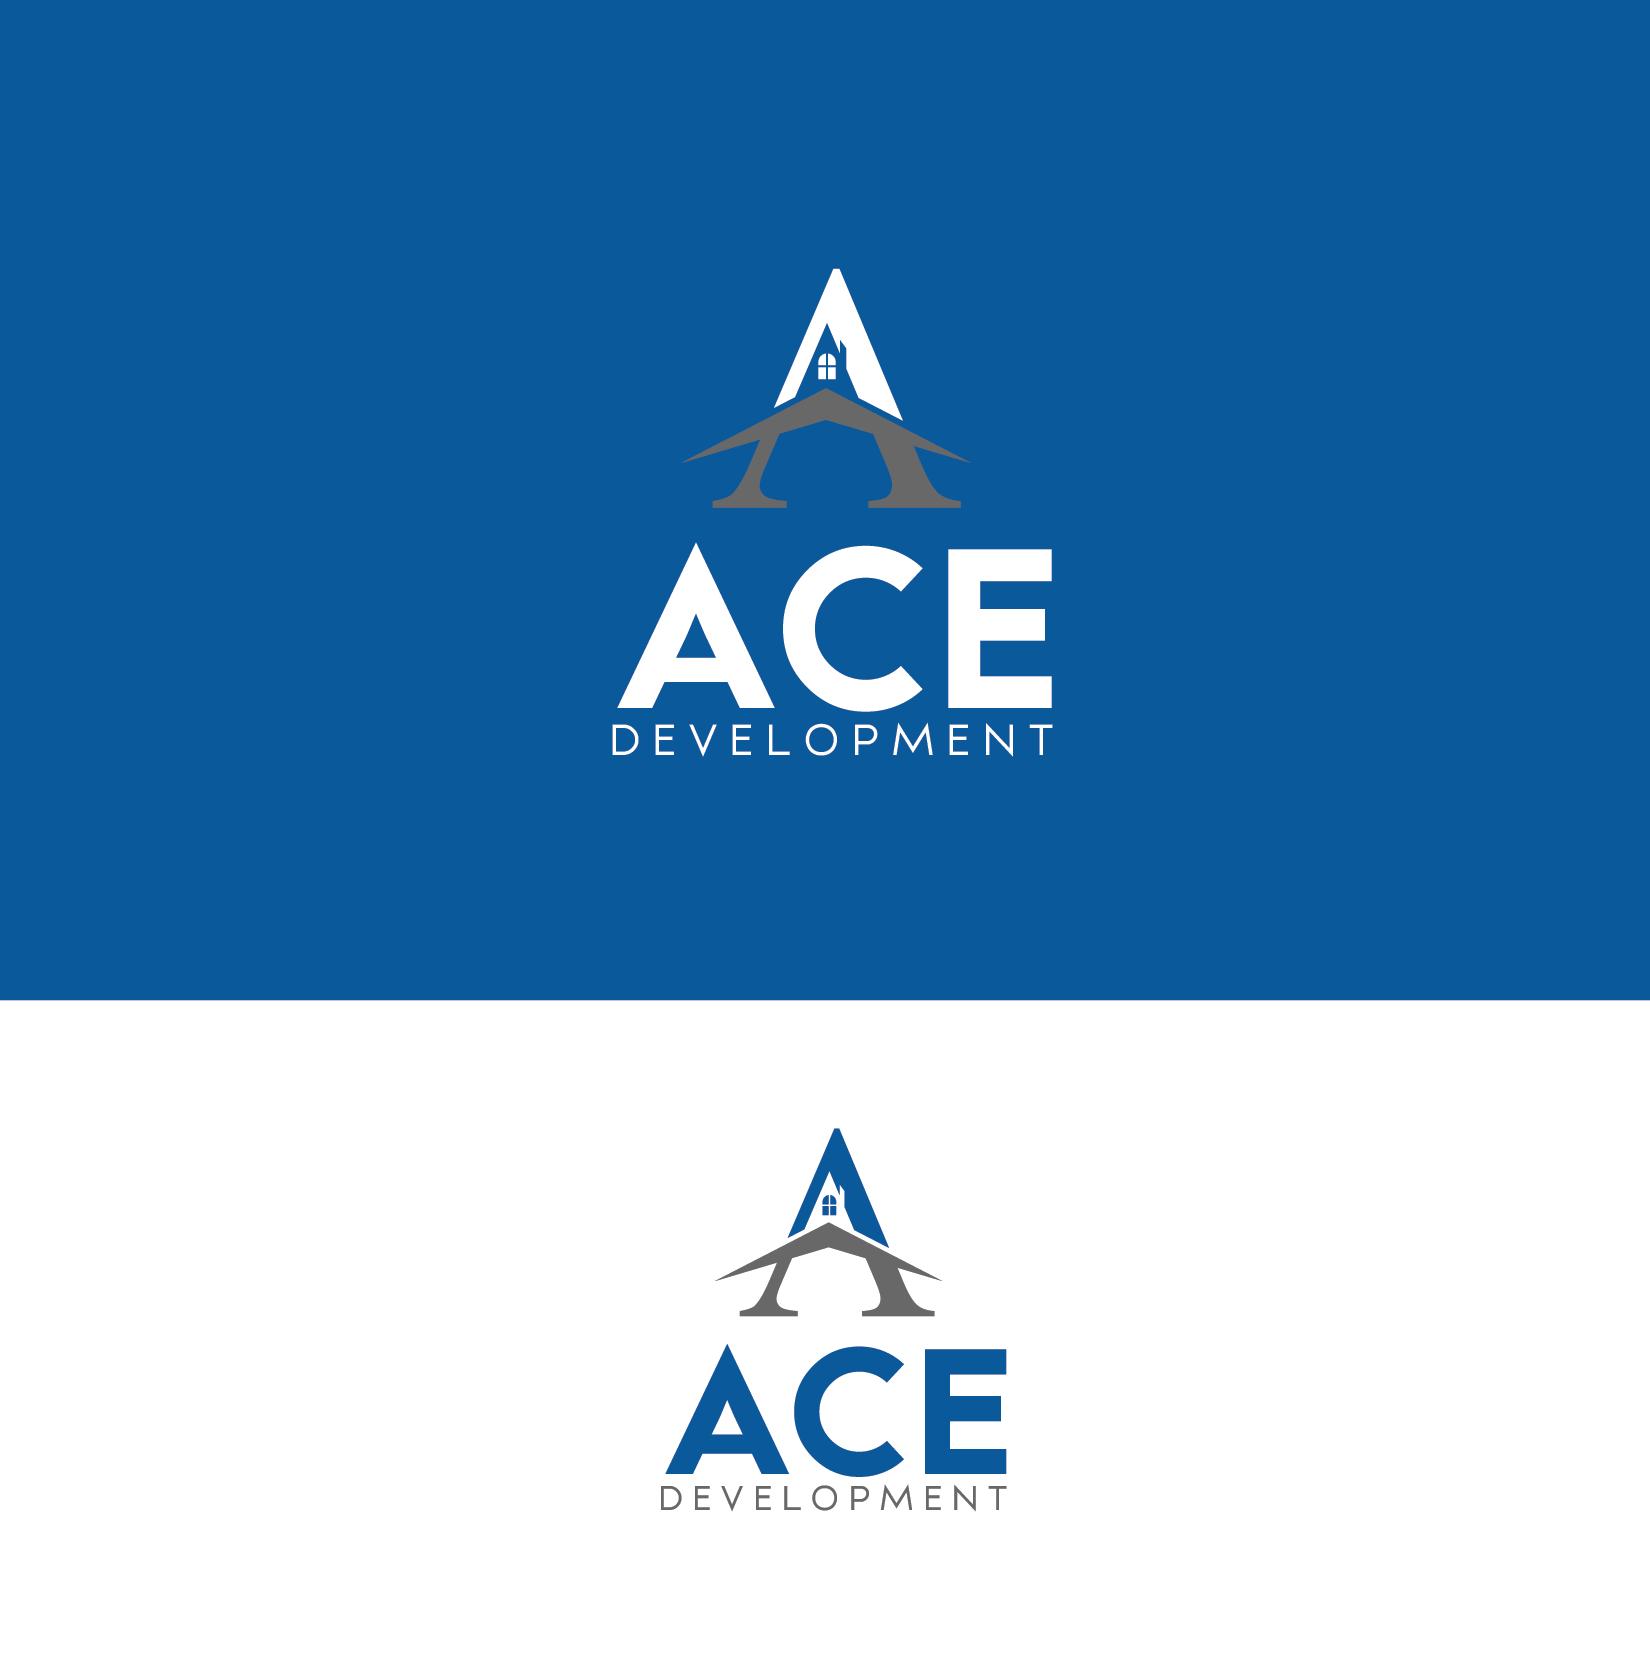 Logo Design by Private User - Entry No. 34 in the Logo Design Contest Fun Logo Design for Ace development.